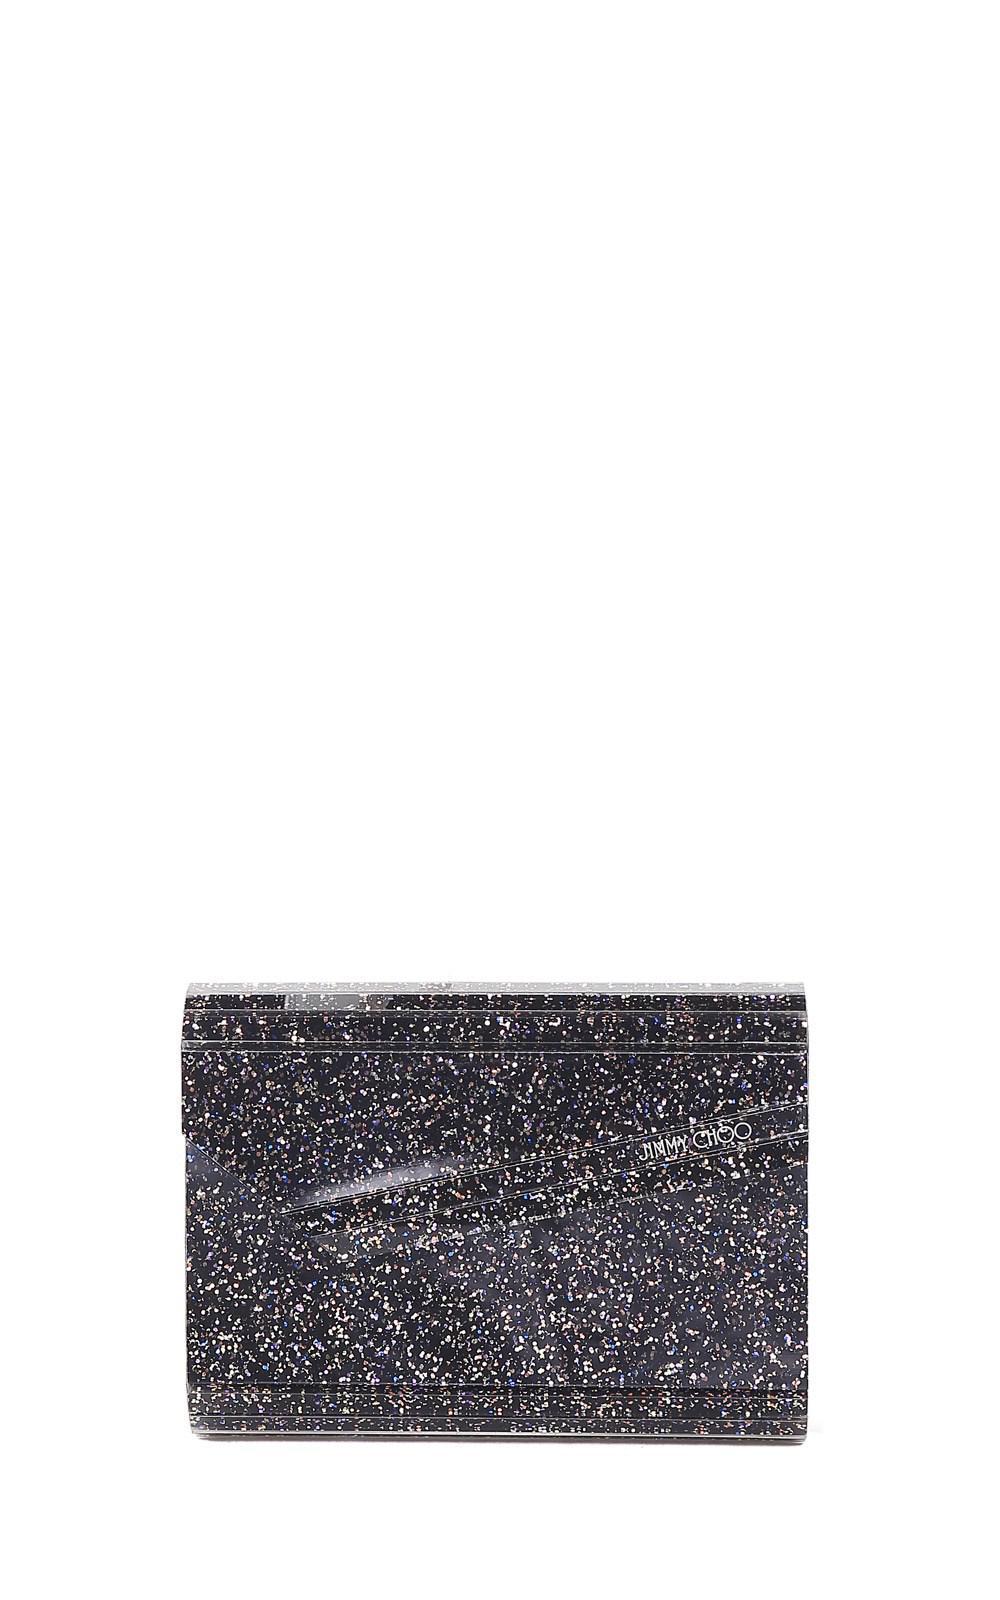 e4aa8057a0cac Lyst - Jimmy Choo Candy Glitter Acrylic Clutch in Blue